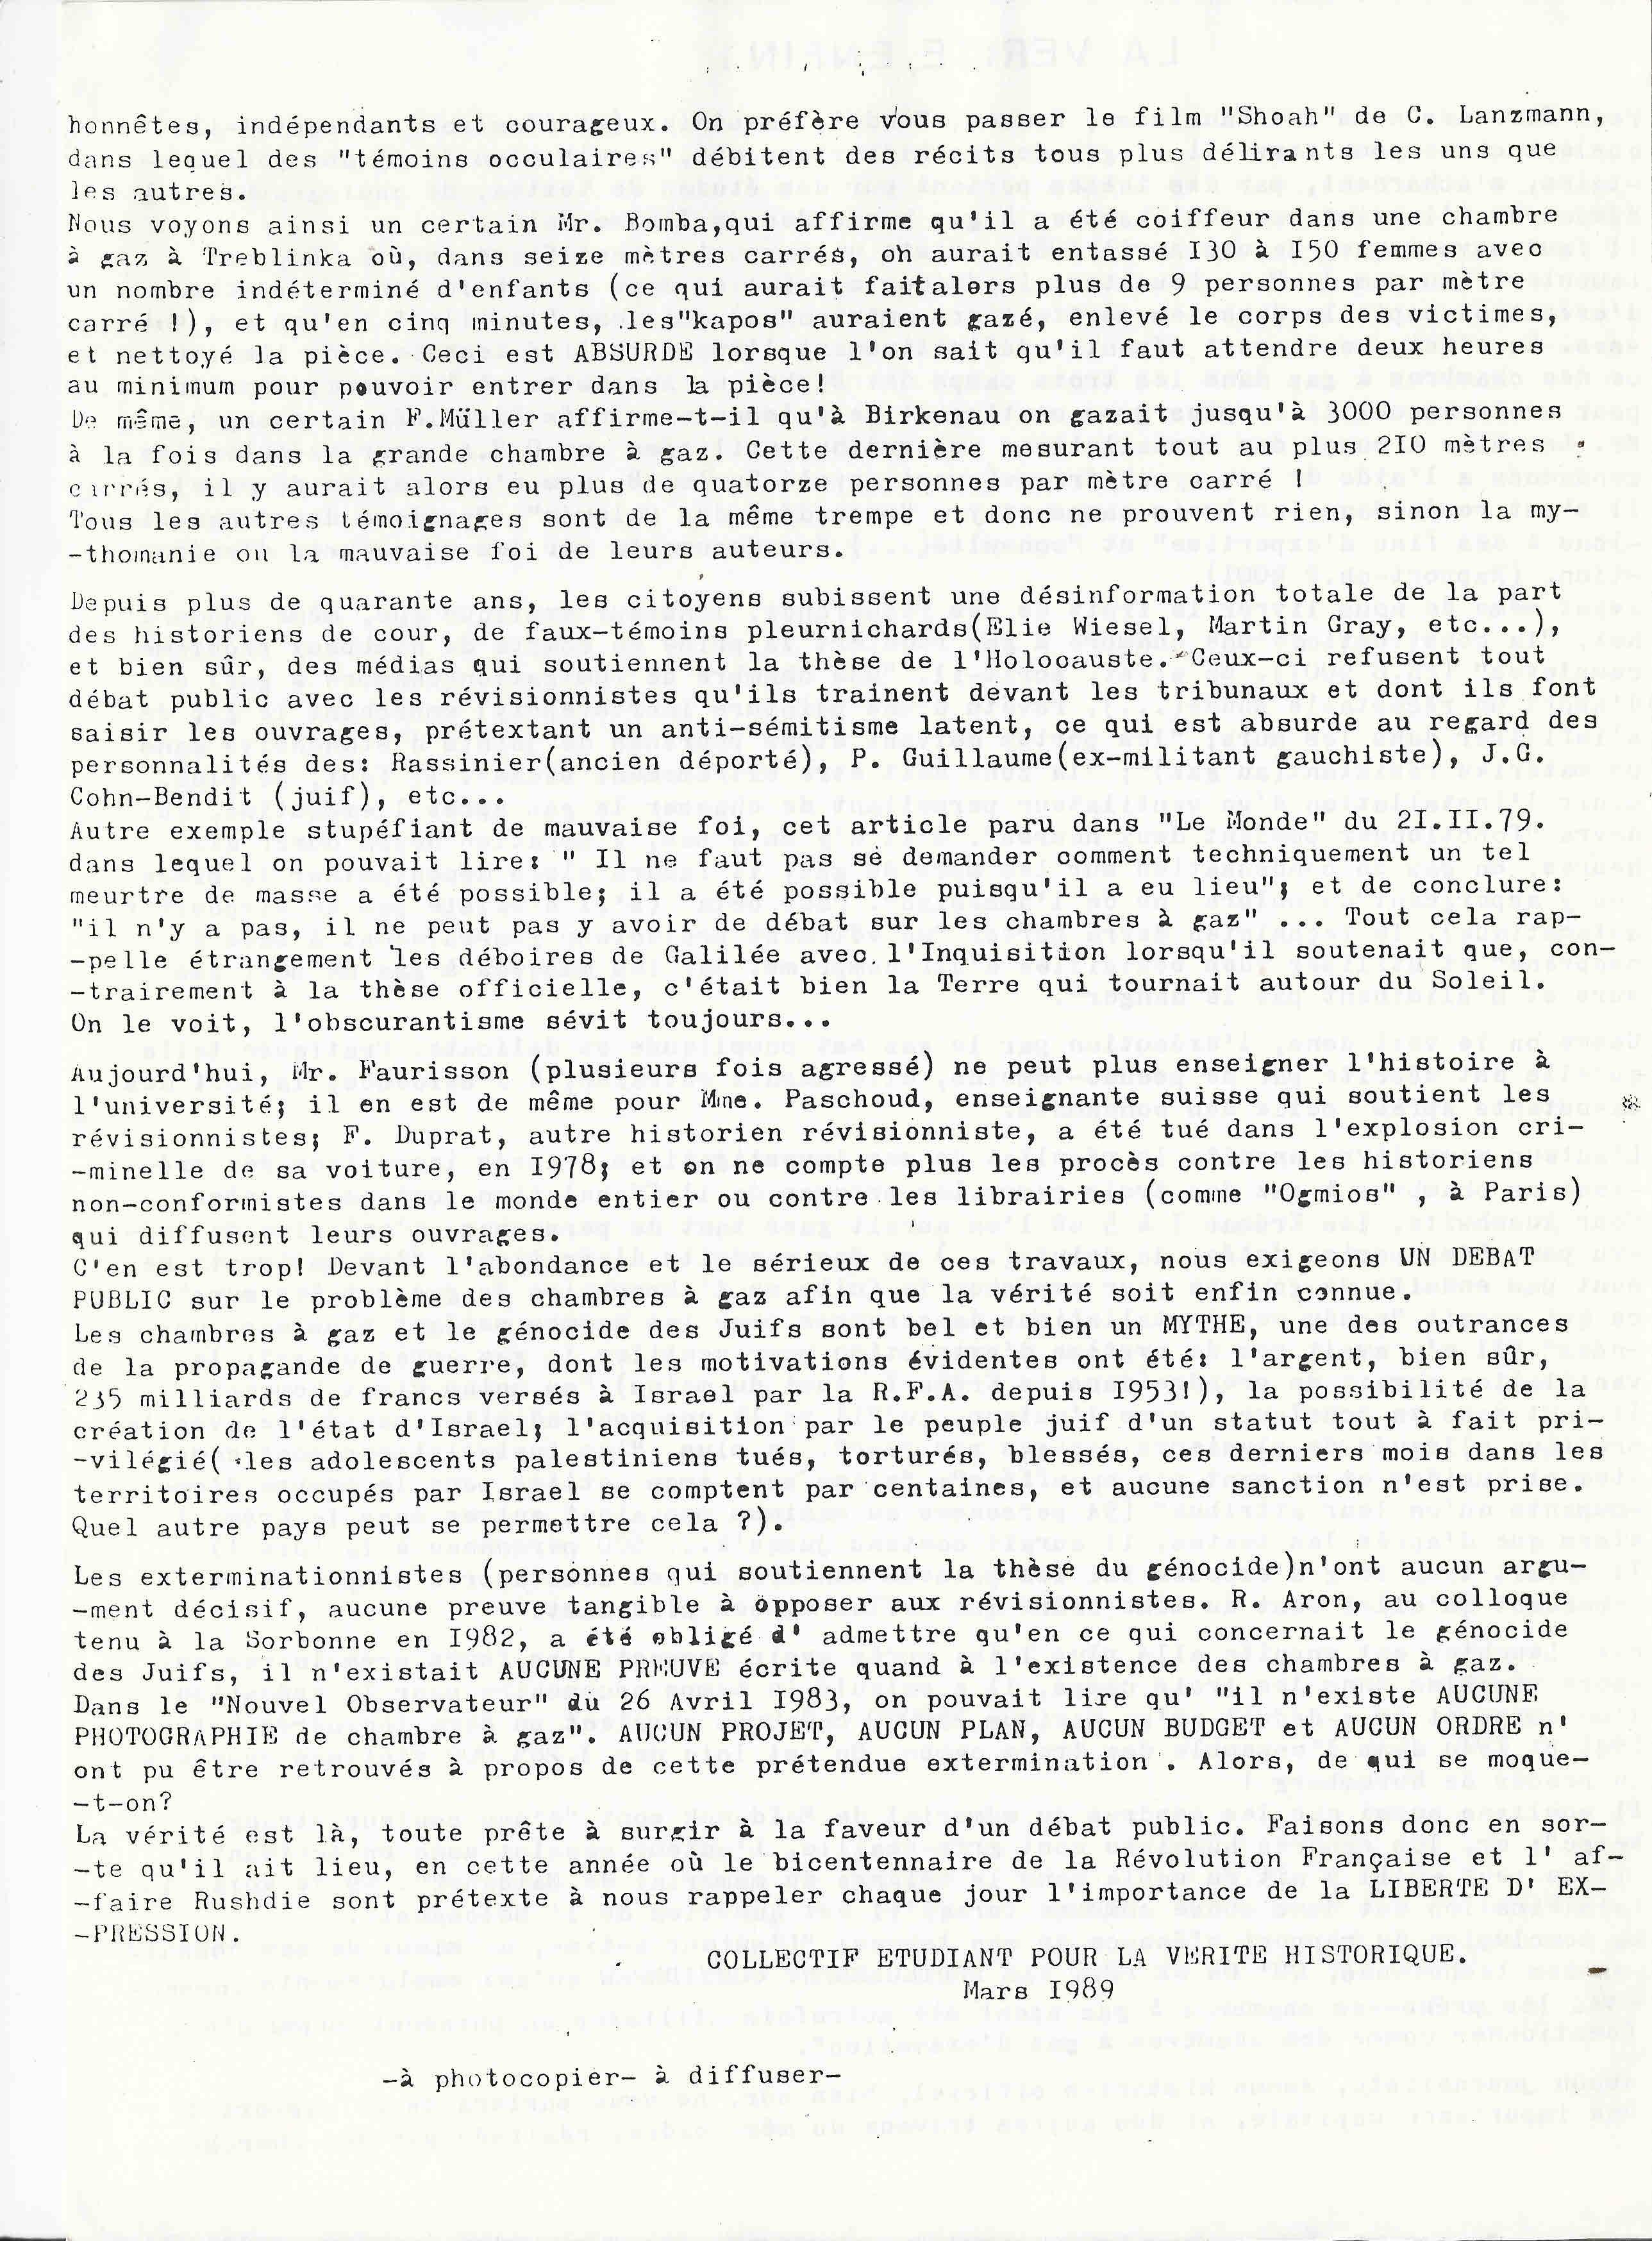 Copy of Scanner_20190105 (29)